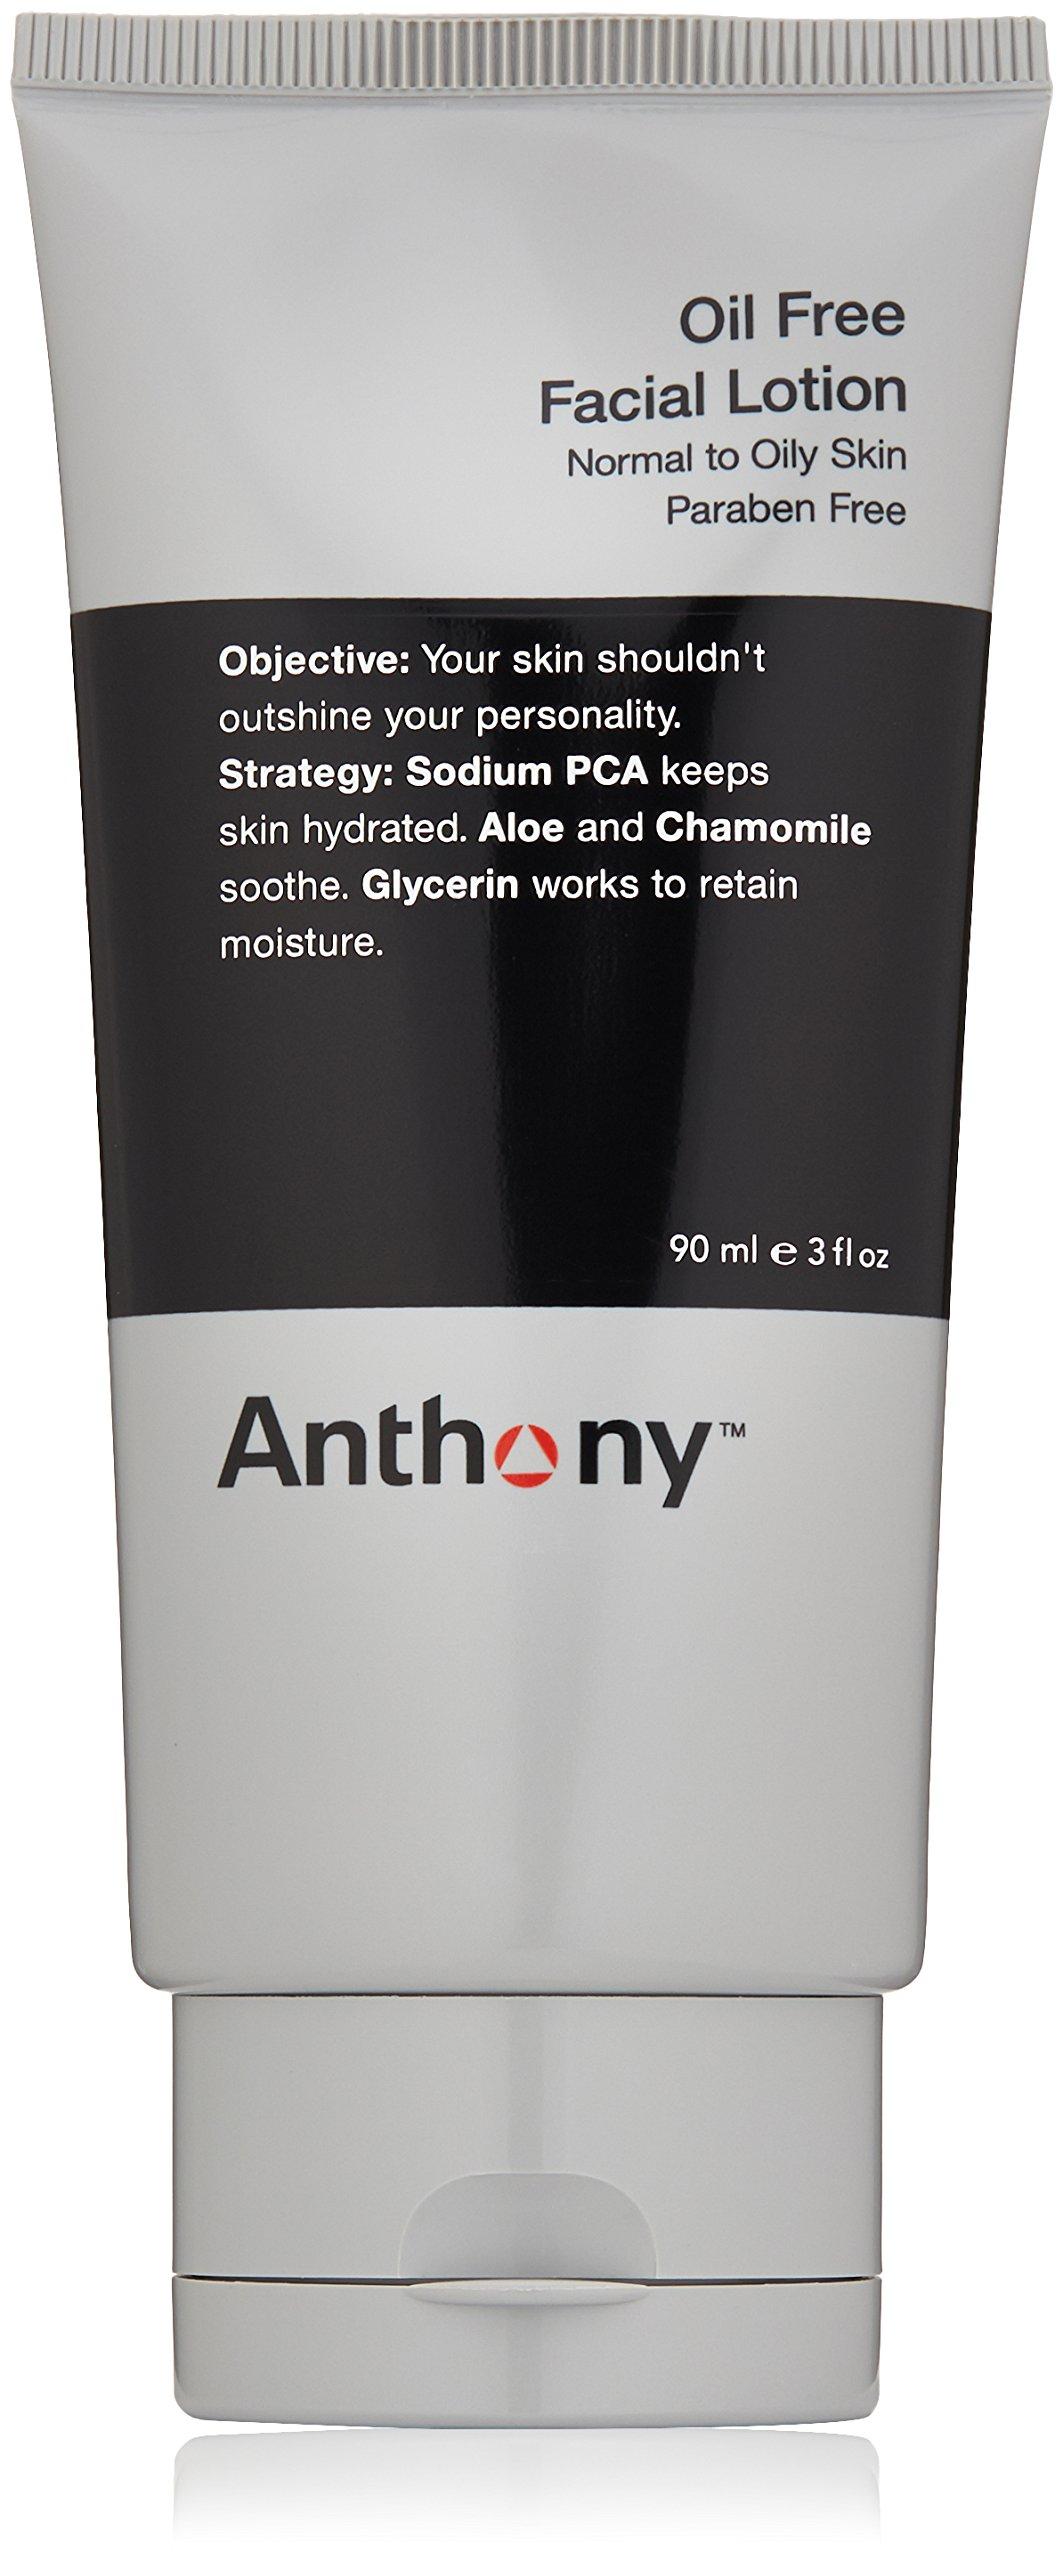 Anthony Oil Free Facial Lotion, 3 fl. oz.